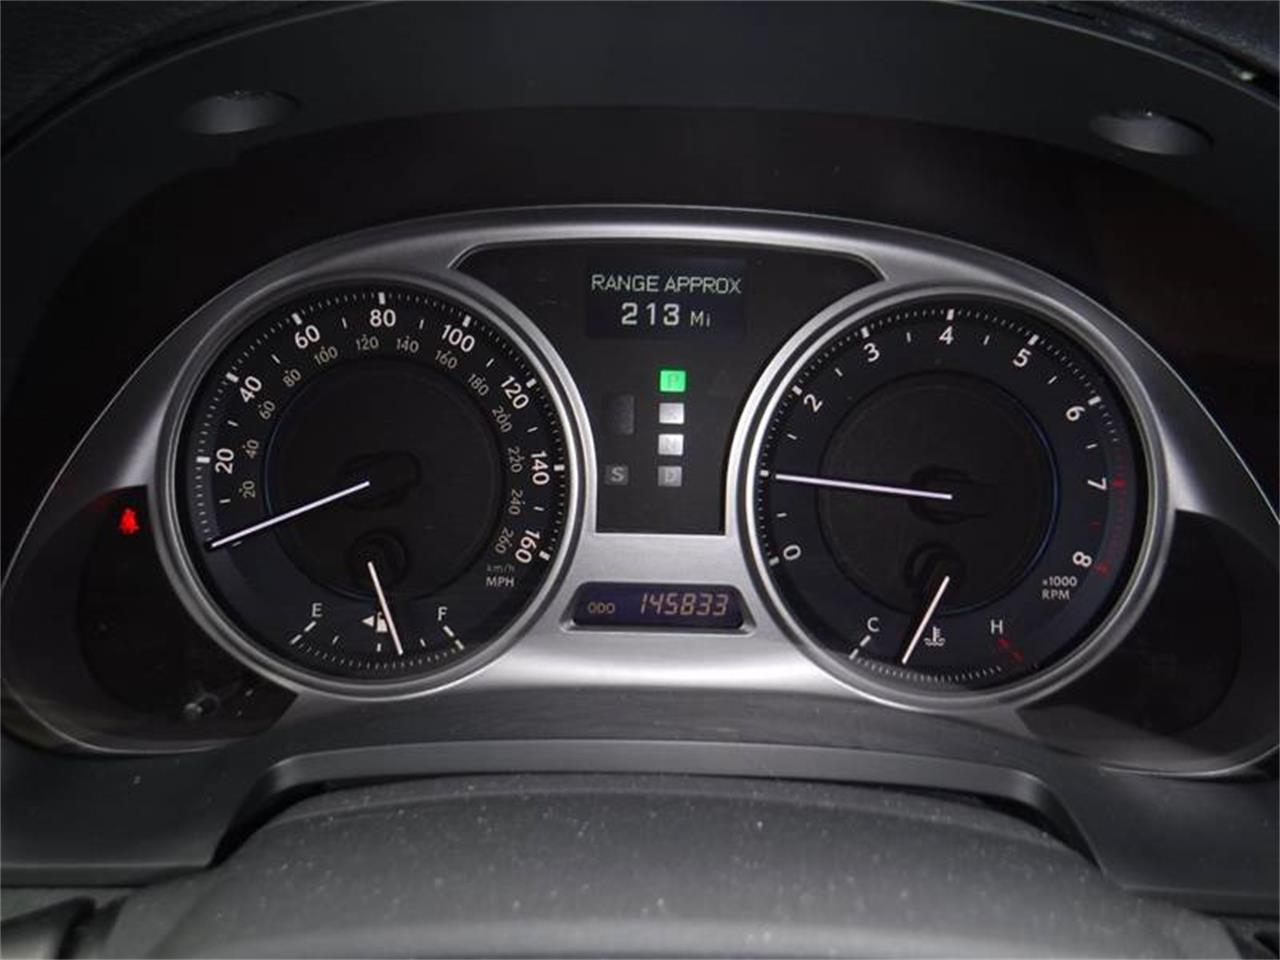 2006 Lexus IS250 (CC-1236289) for sale in Thousand Oaks, California